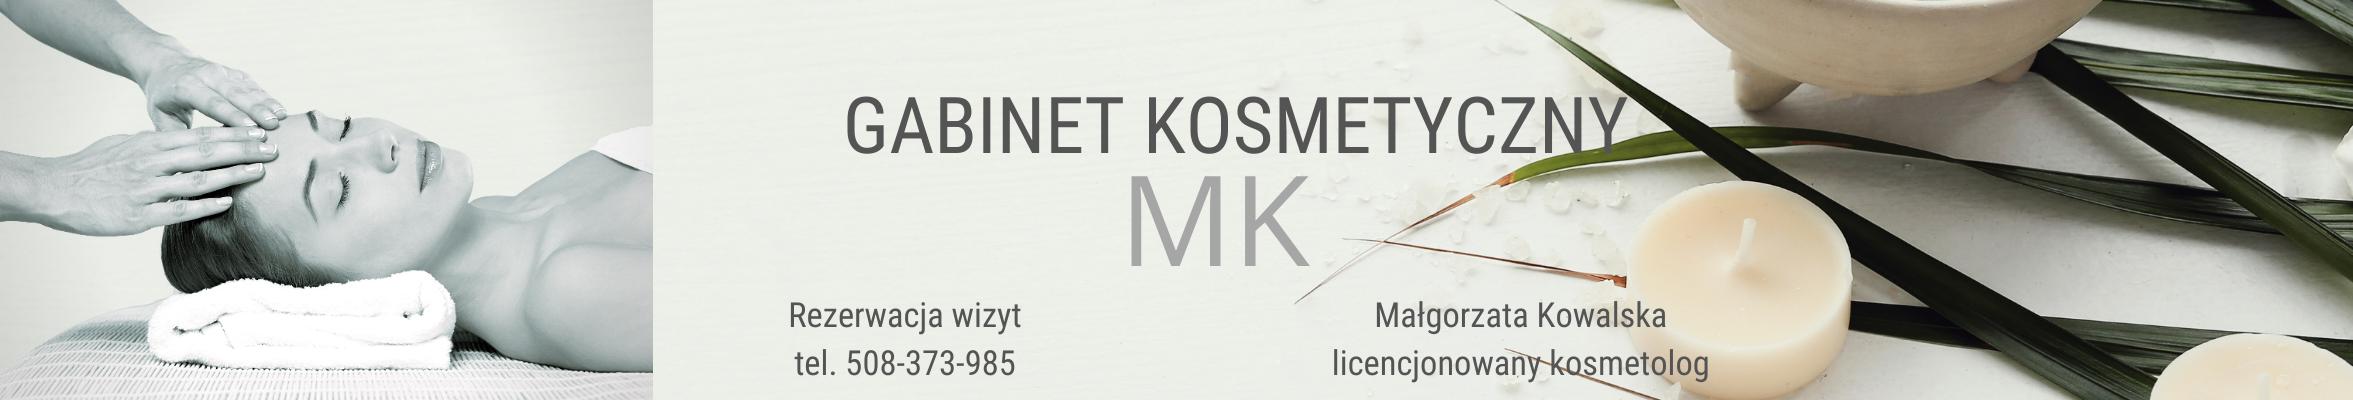 Gabinet kosmetyczny MK